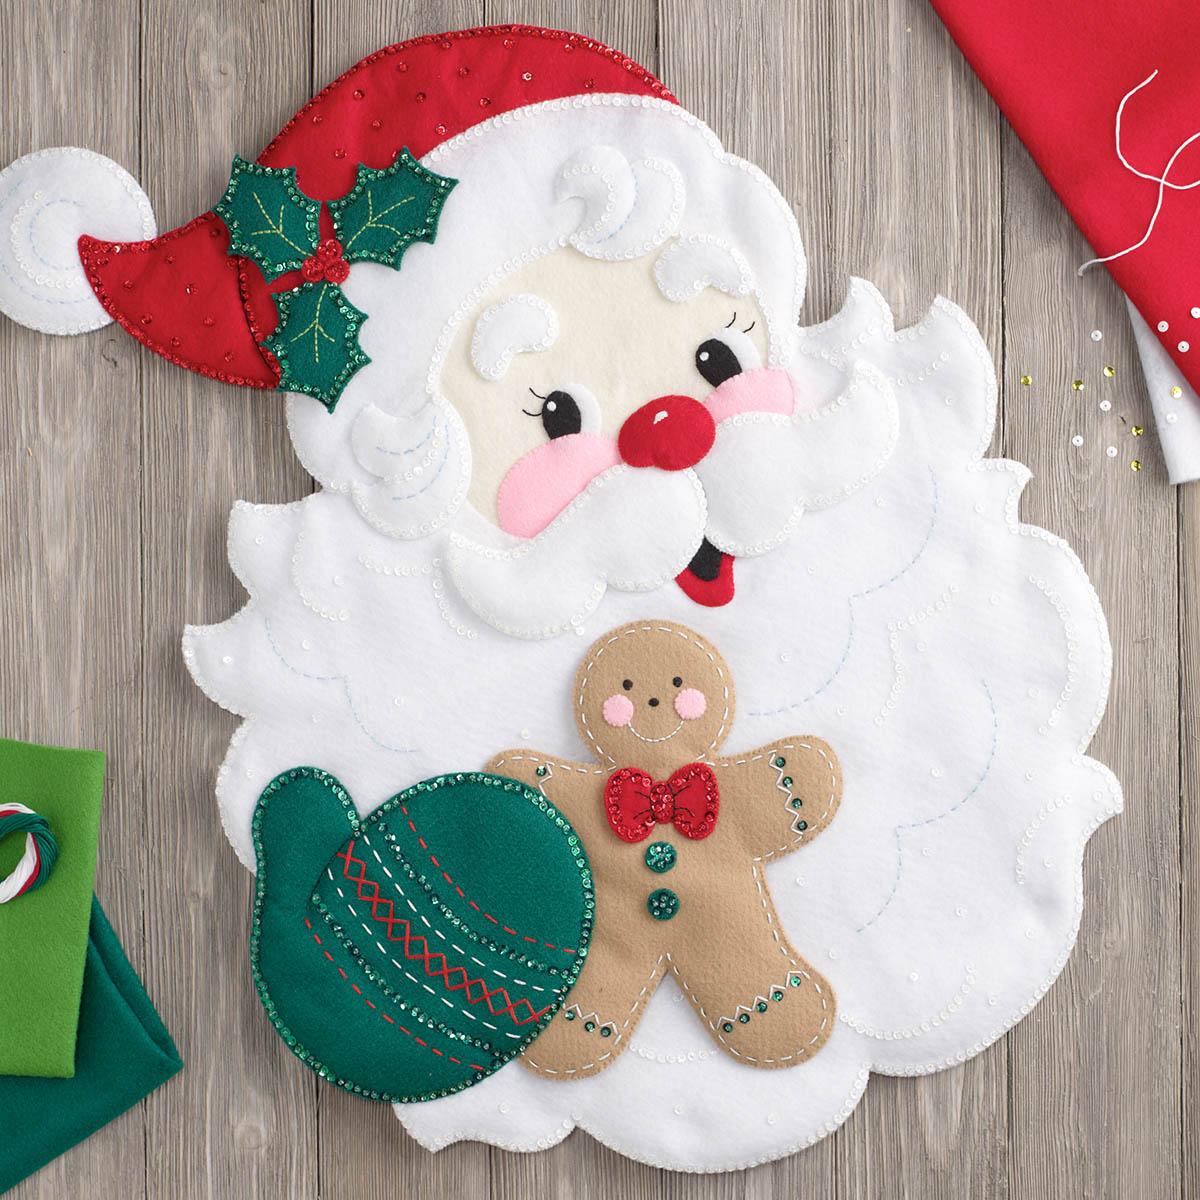 Bucilla ® Seasonal - Felt - Home Decor - Door/Wall Hanging Kits - Santa's Treats